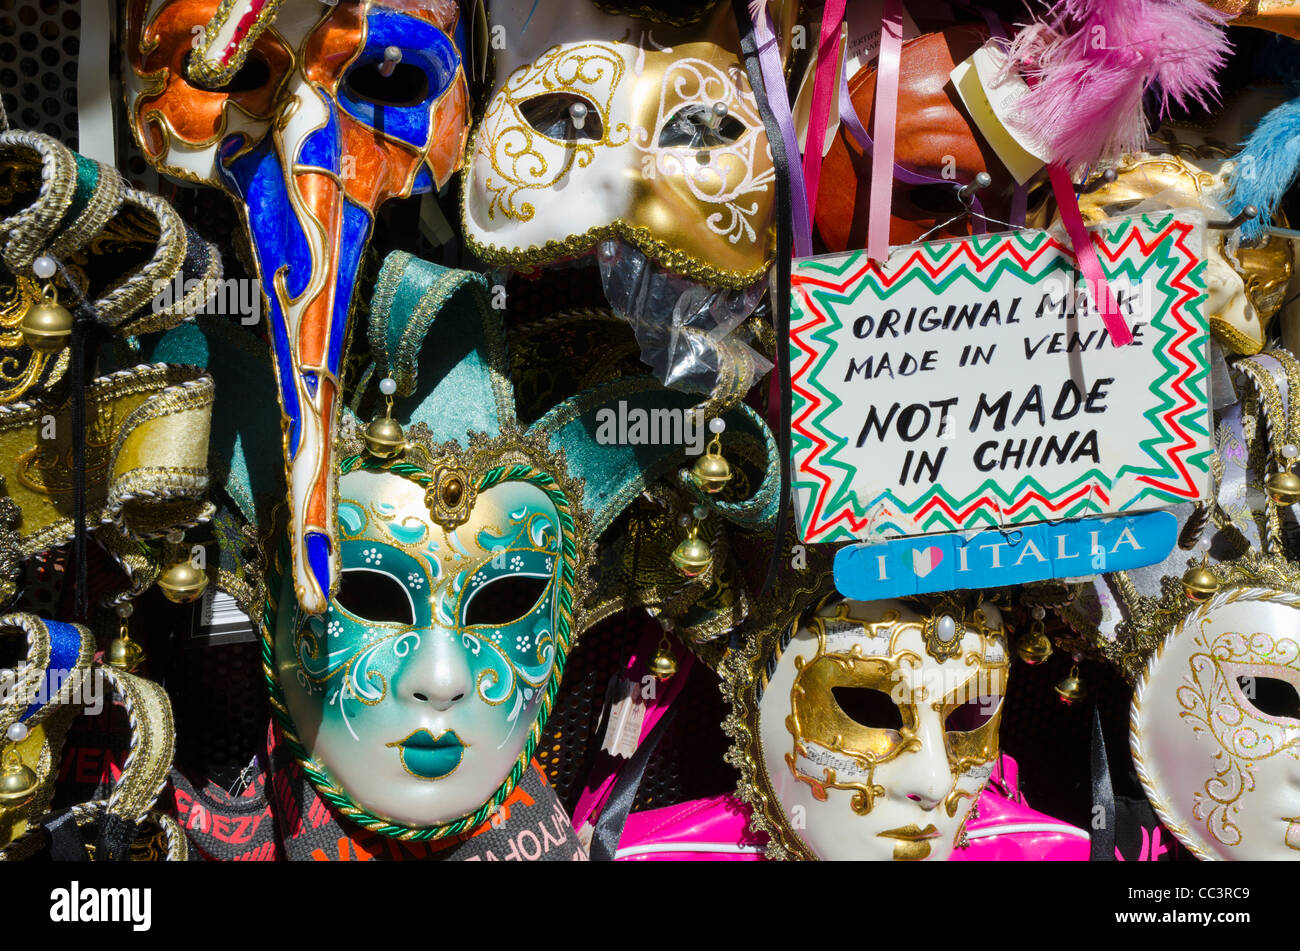 Italien, Veneto, Venedig, venezianische Masken zum Verkauf Stockbild